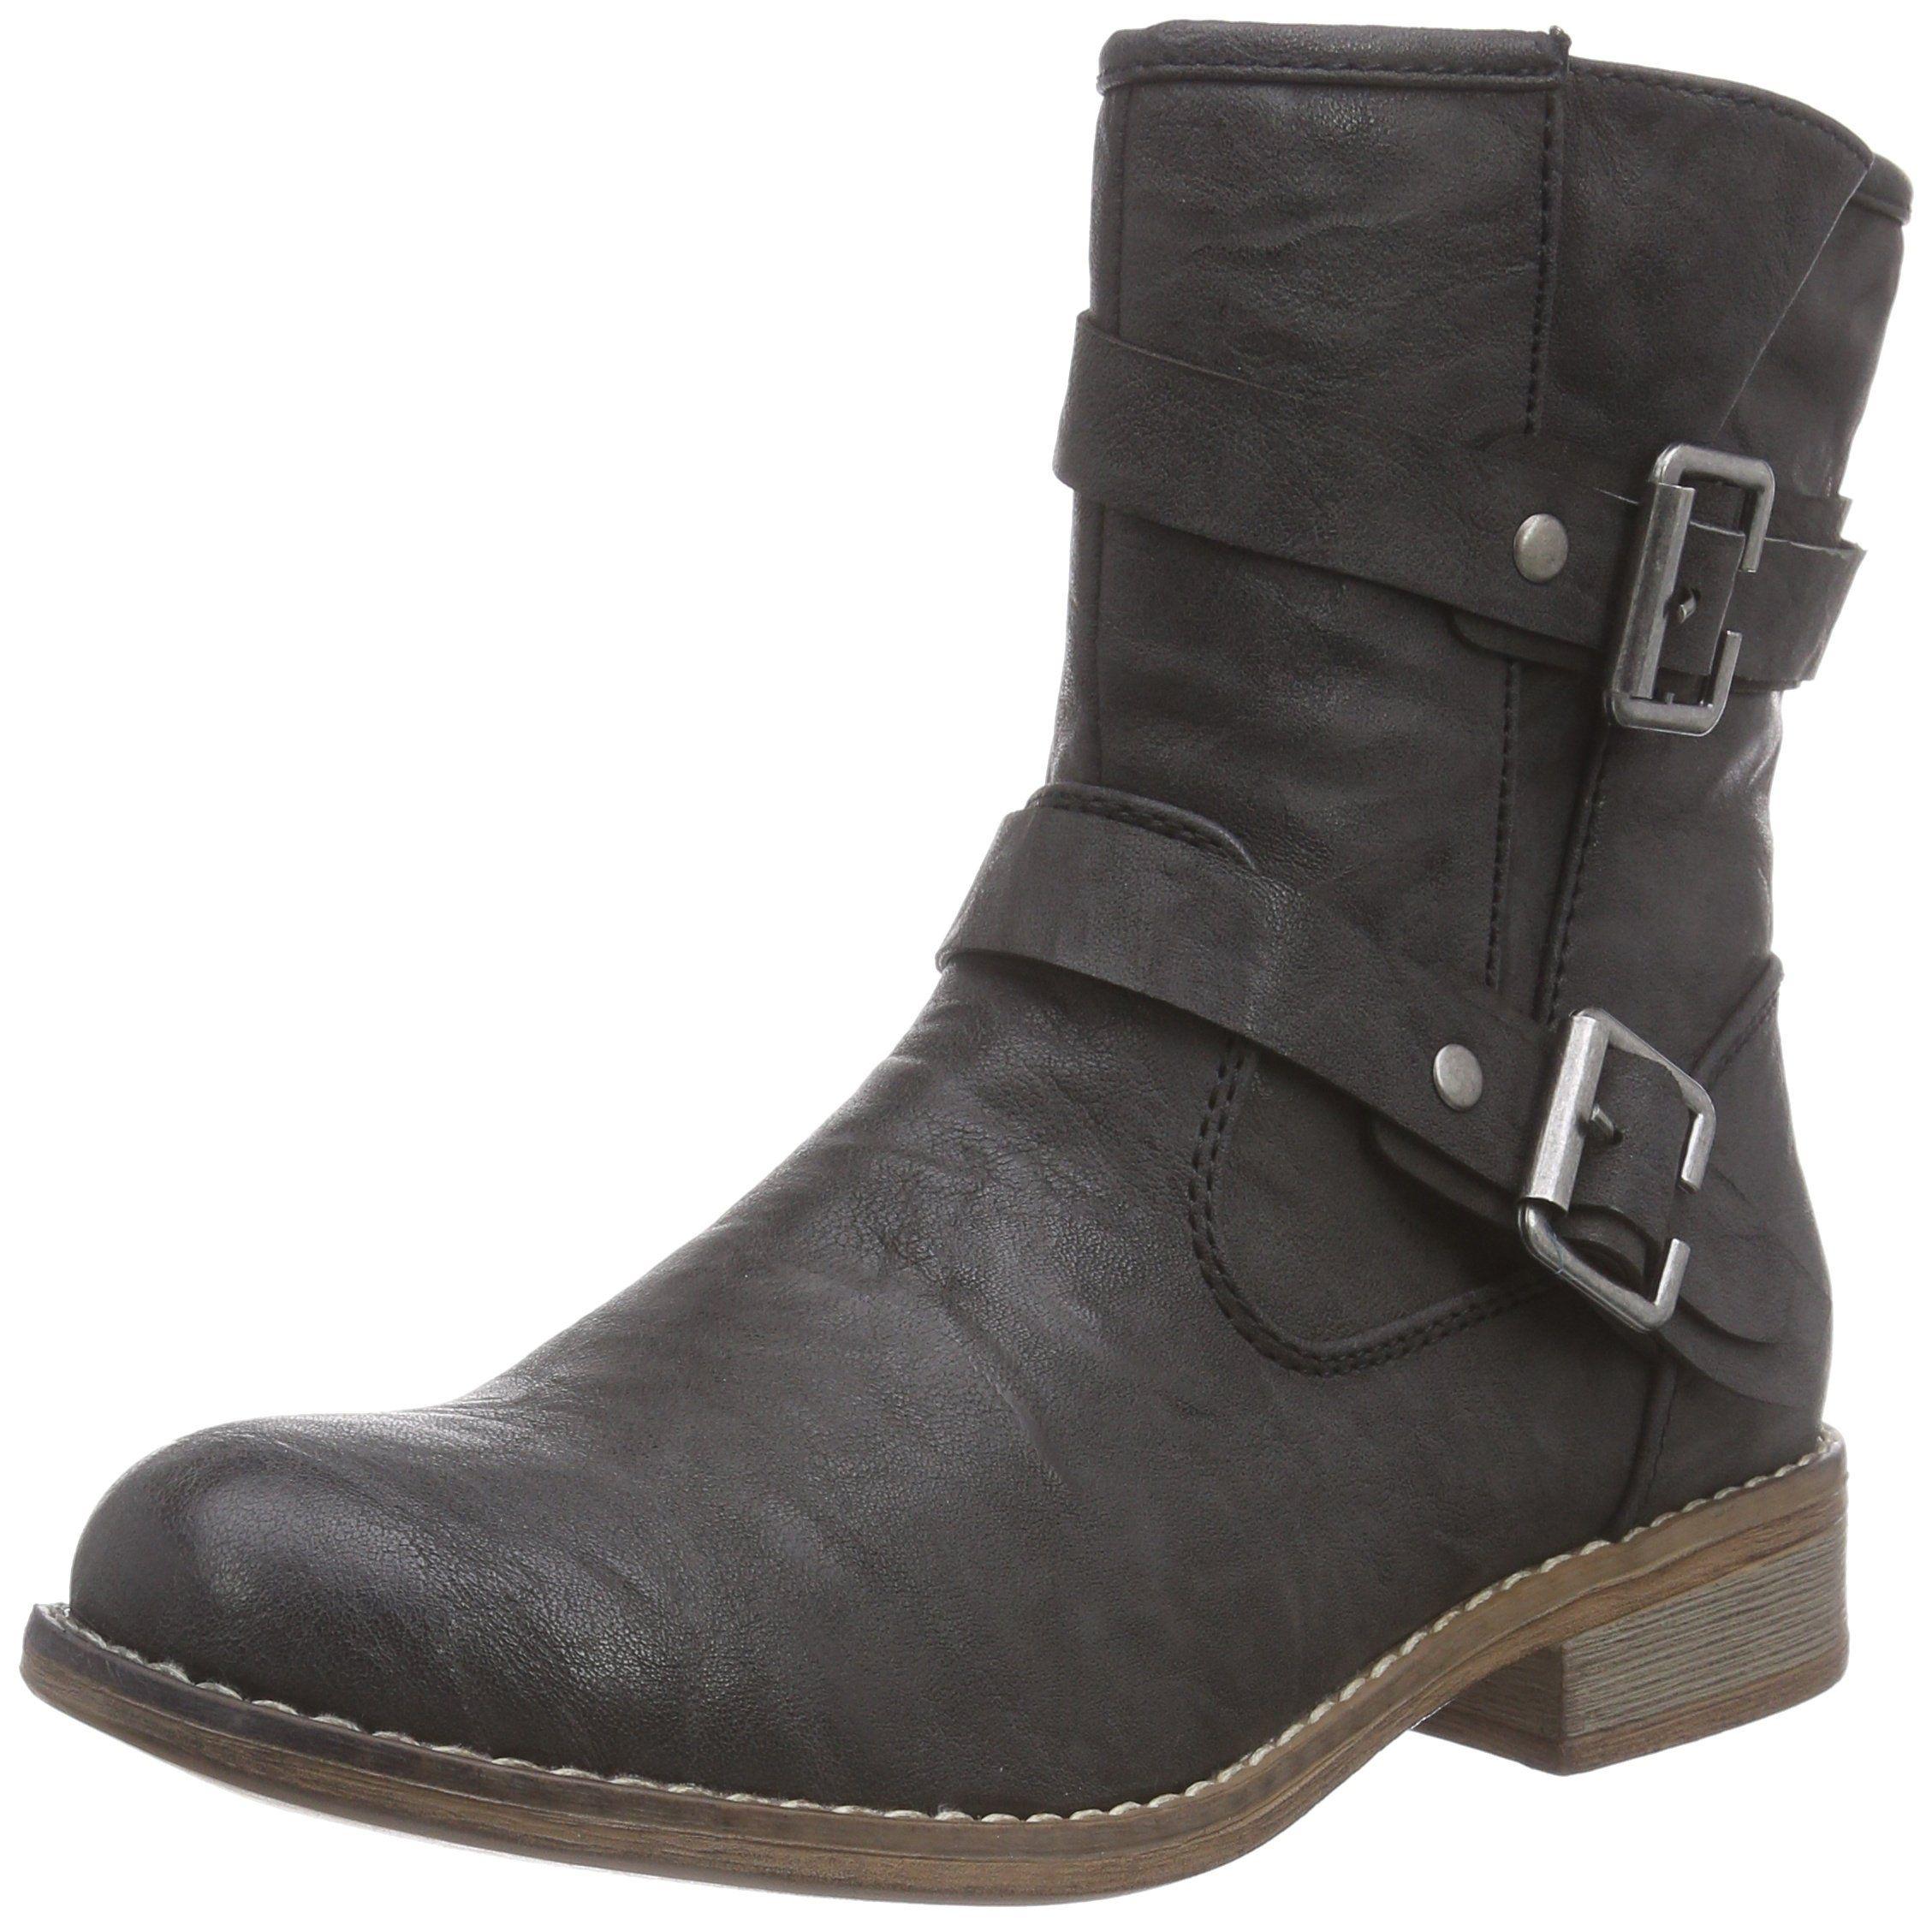 Rieker Cowboy Bikerstiefelette jeans | Stiefel